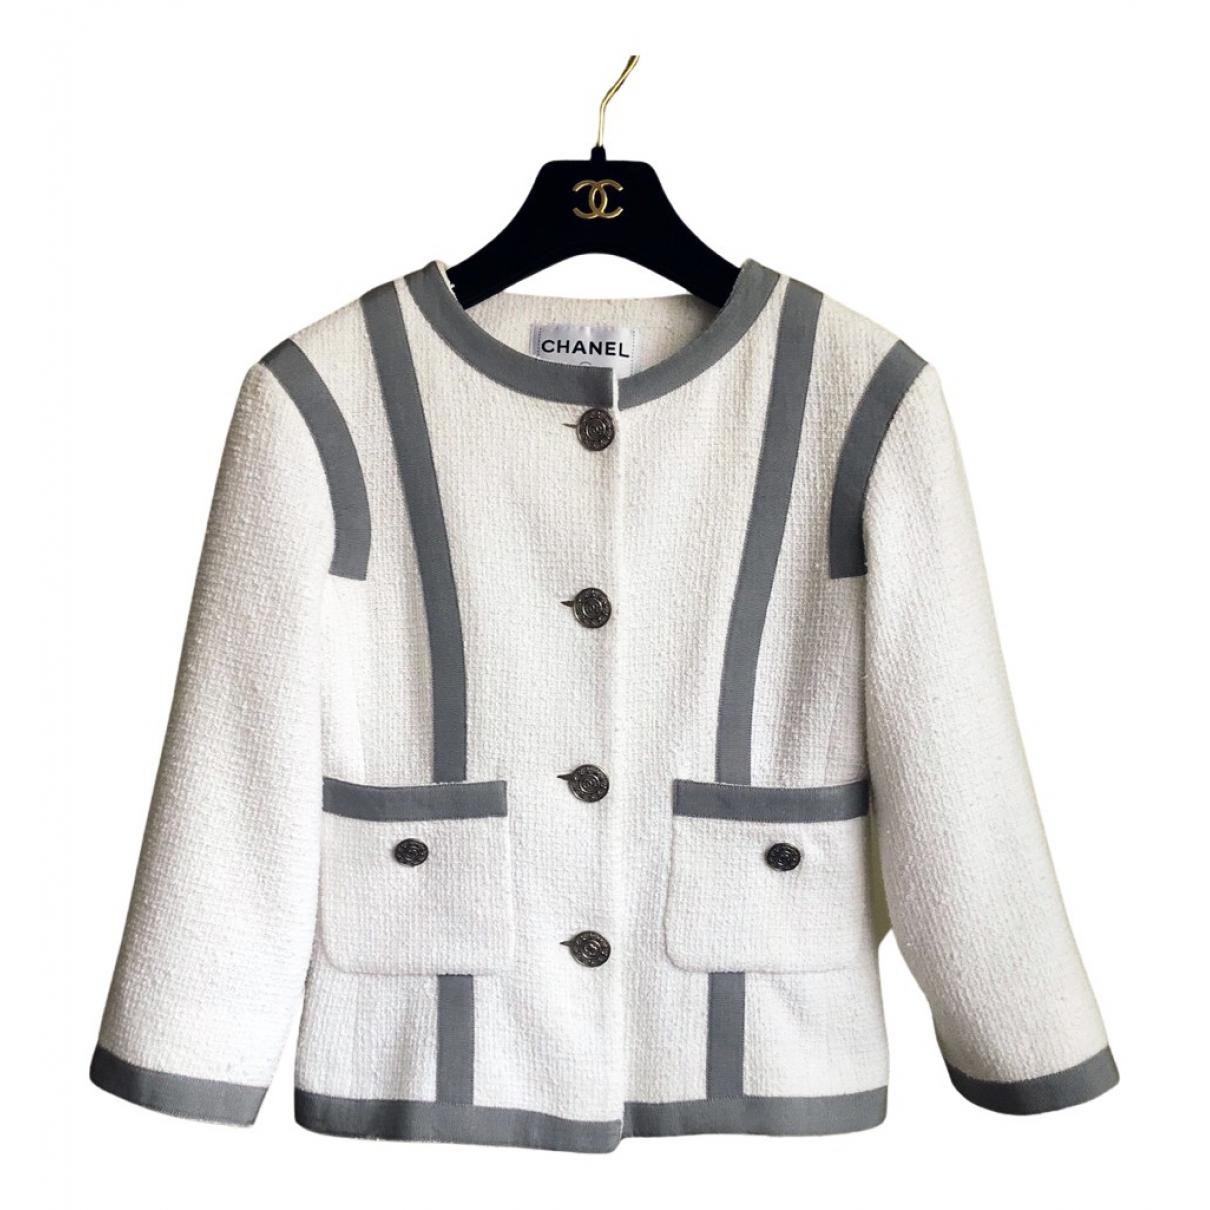 Chanel \N Jacke in  Weiss Tweed